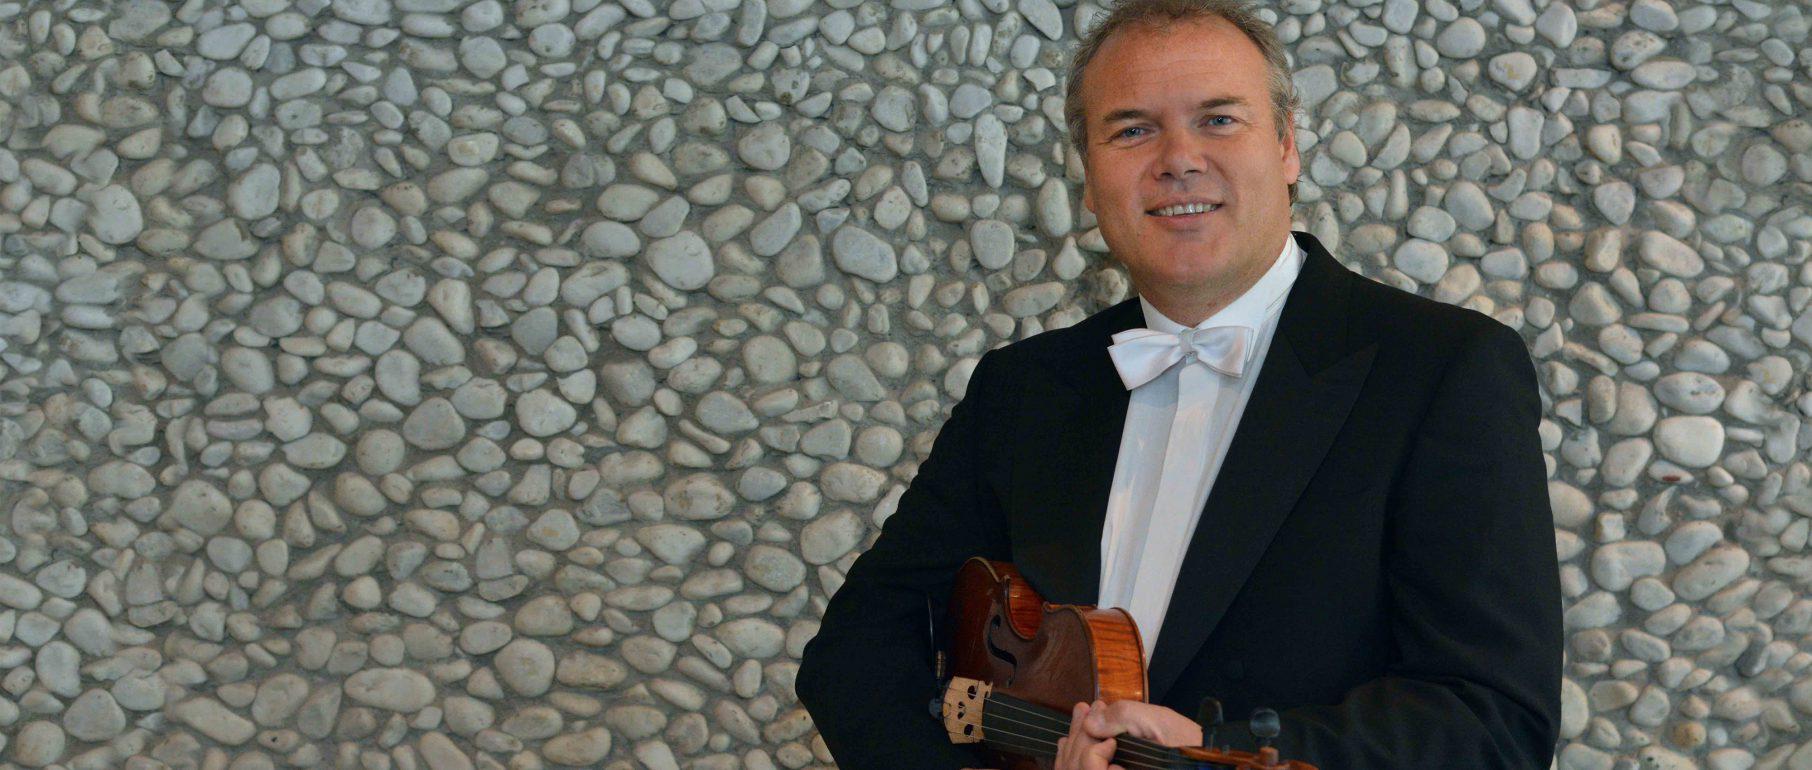 Tomasz Korniluk, Viola